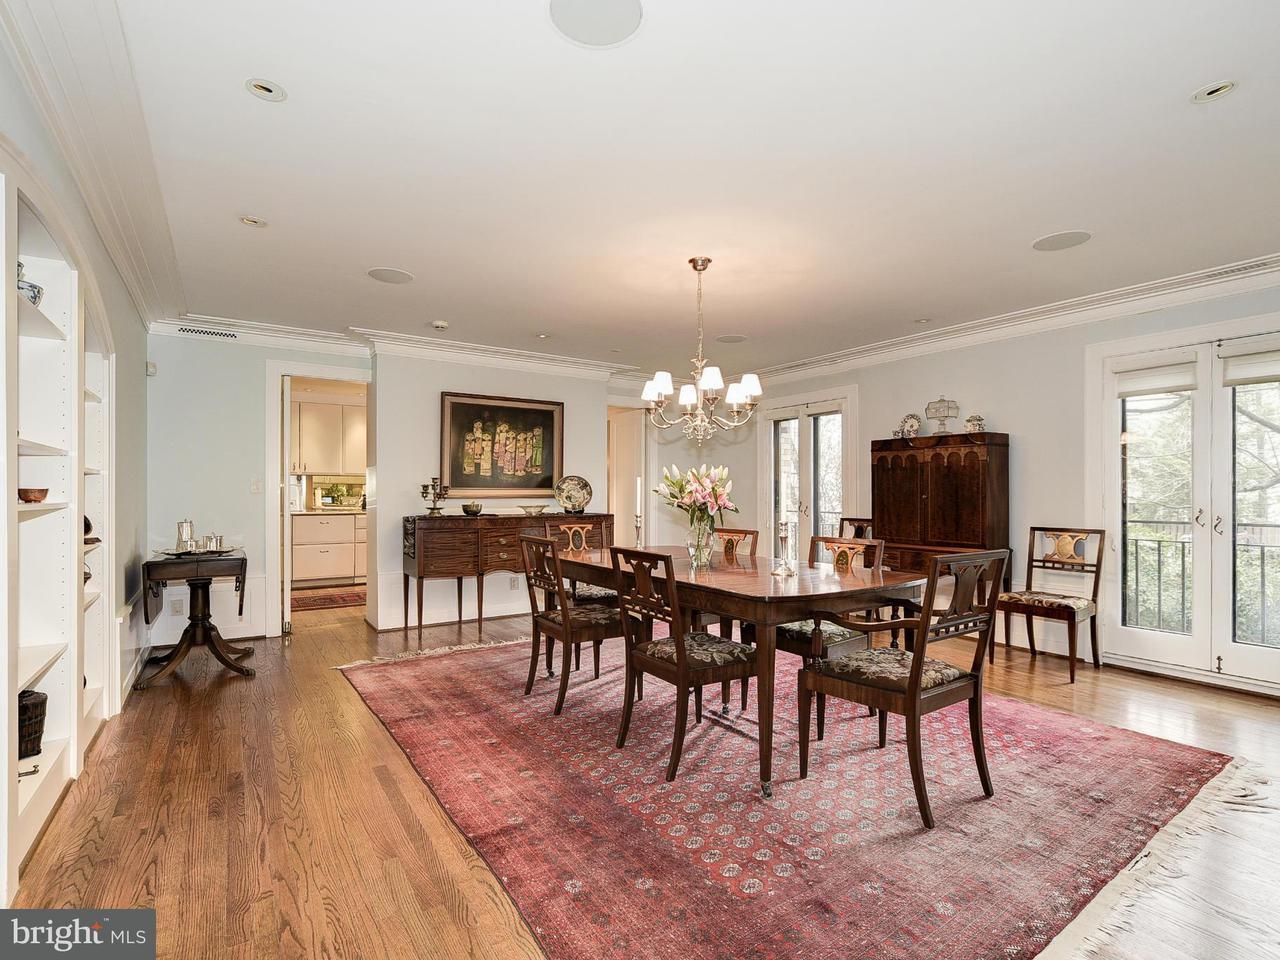 Additional photo for property listing at 2030 HILLYER PL NW 2030 HILLYER PL NW Washington, Округ Колумбия 20009 Соединенные Штаты